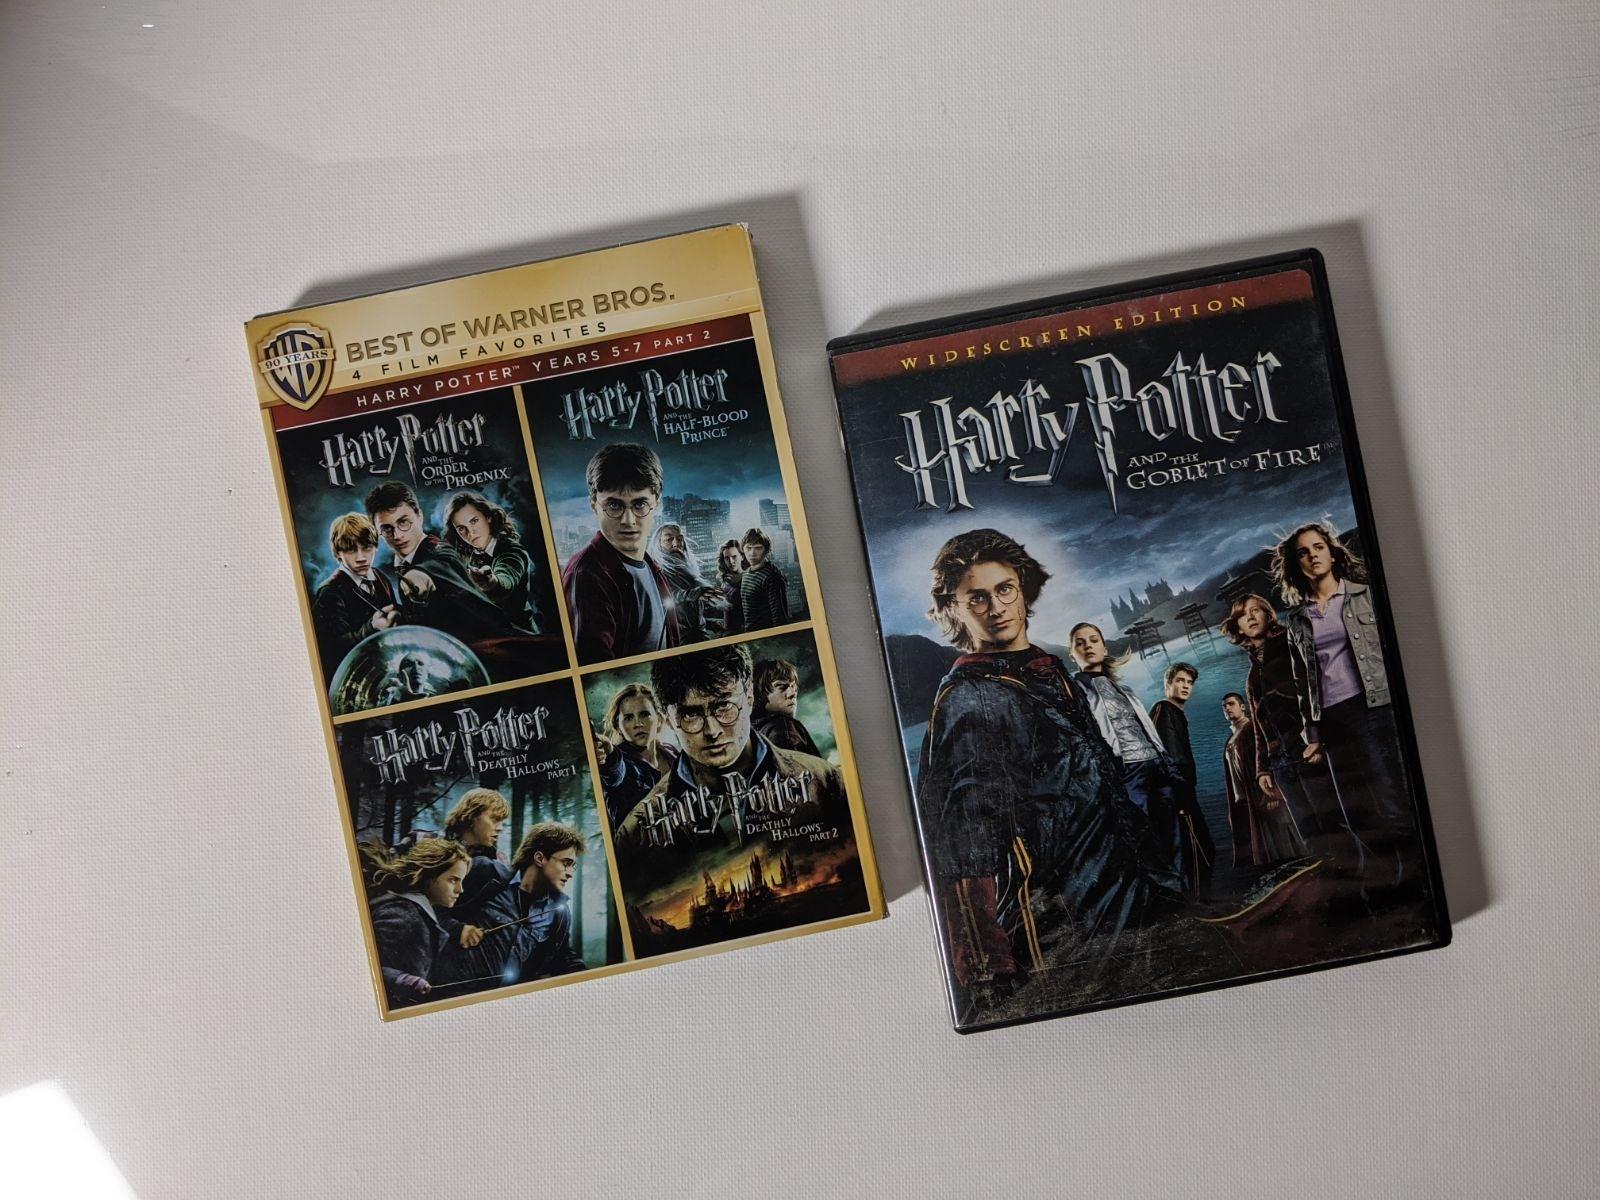 Harry Potter Years 4-7 DVD Bundle